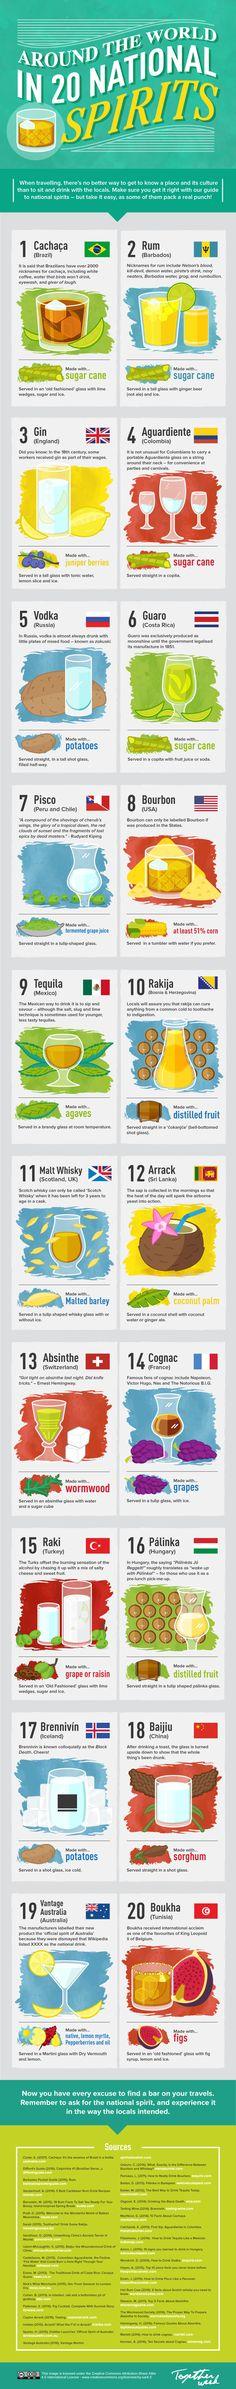 Around the World in 20 National Spirits #Infographic #Travel